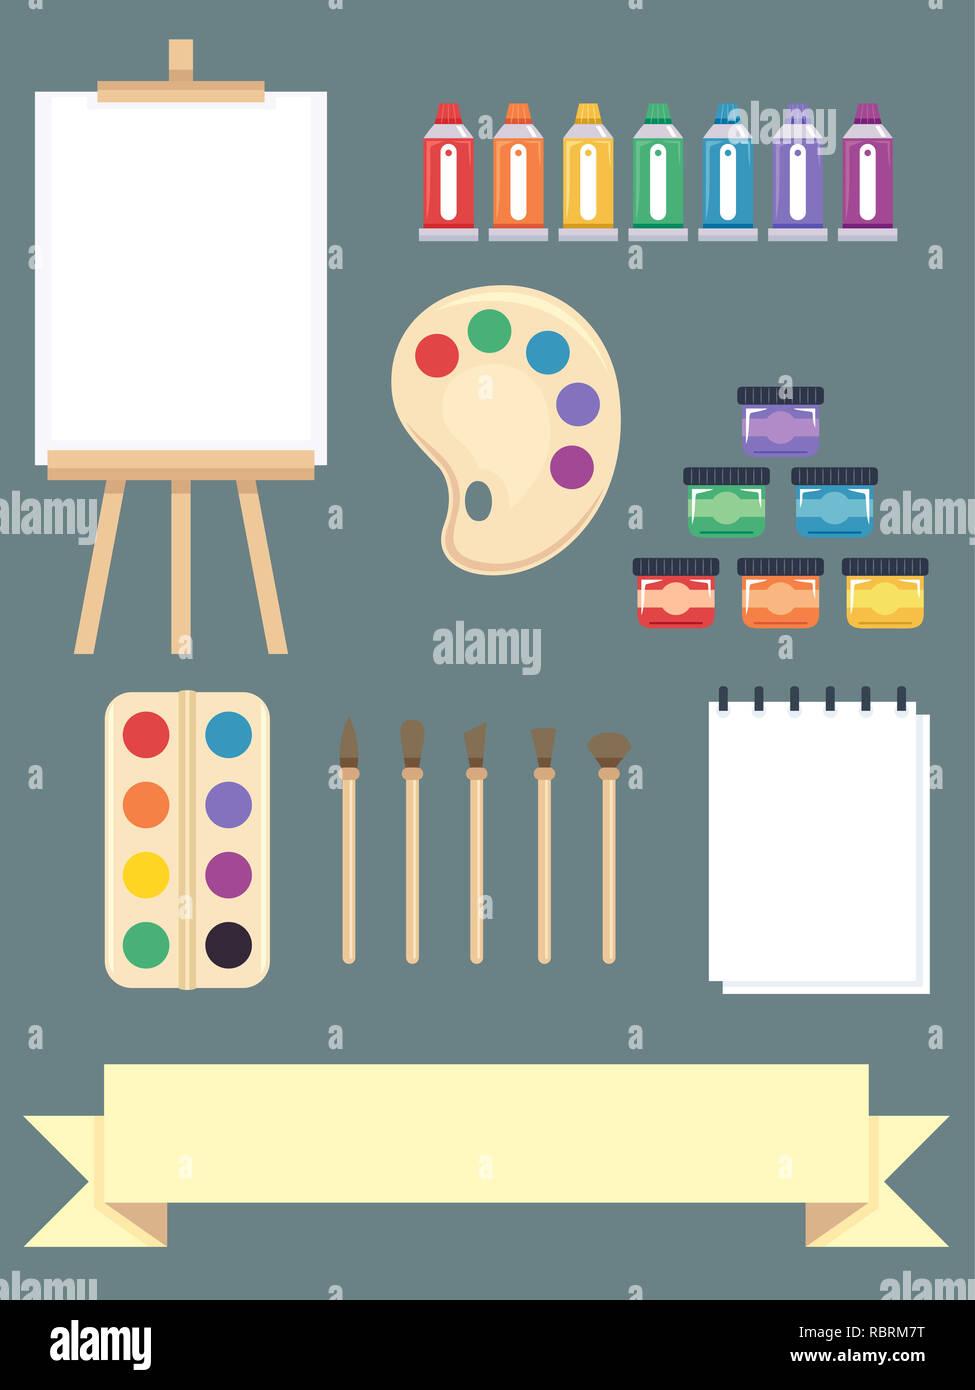 Abbildung Malerei Elemente Aus Staffelei Leinwand Farben